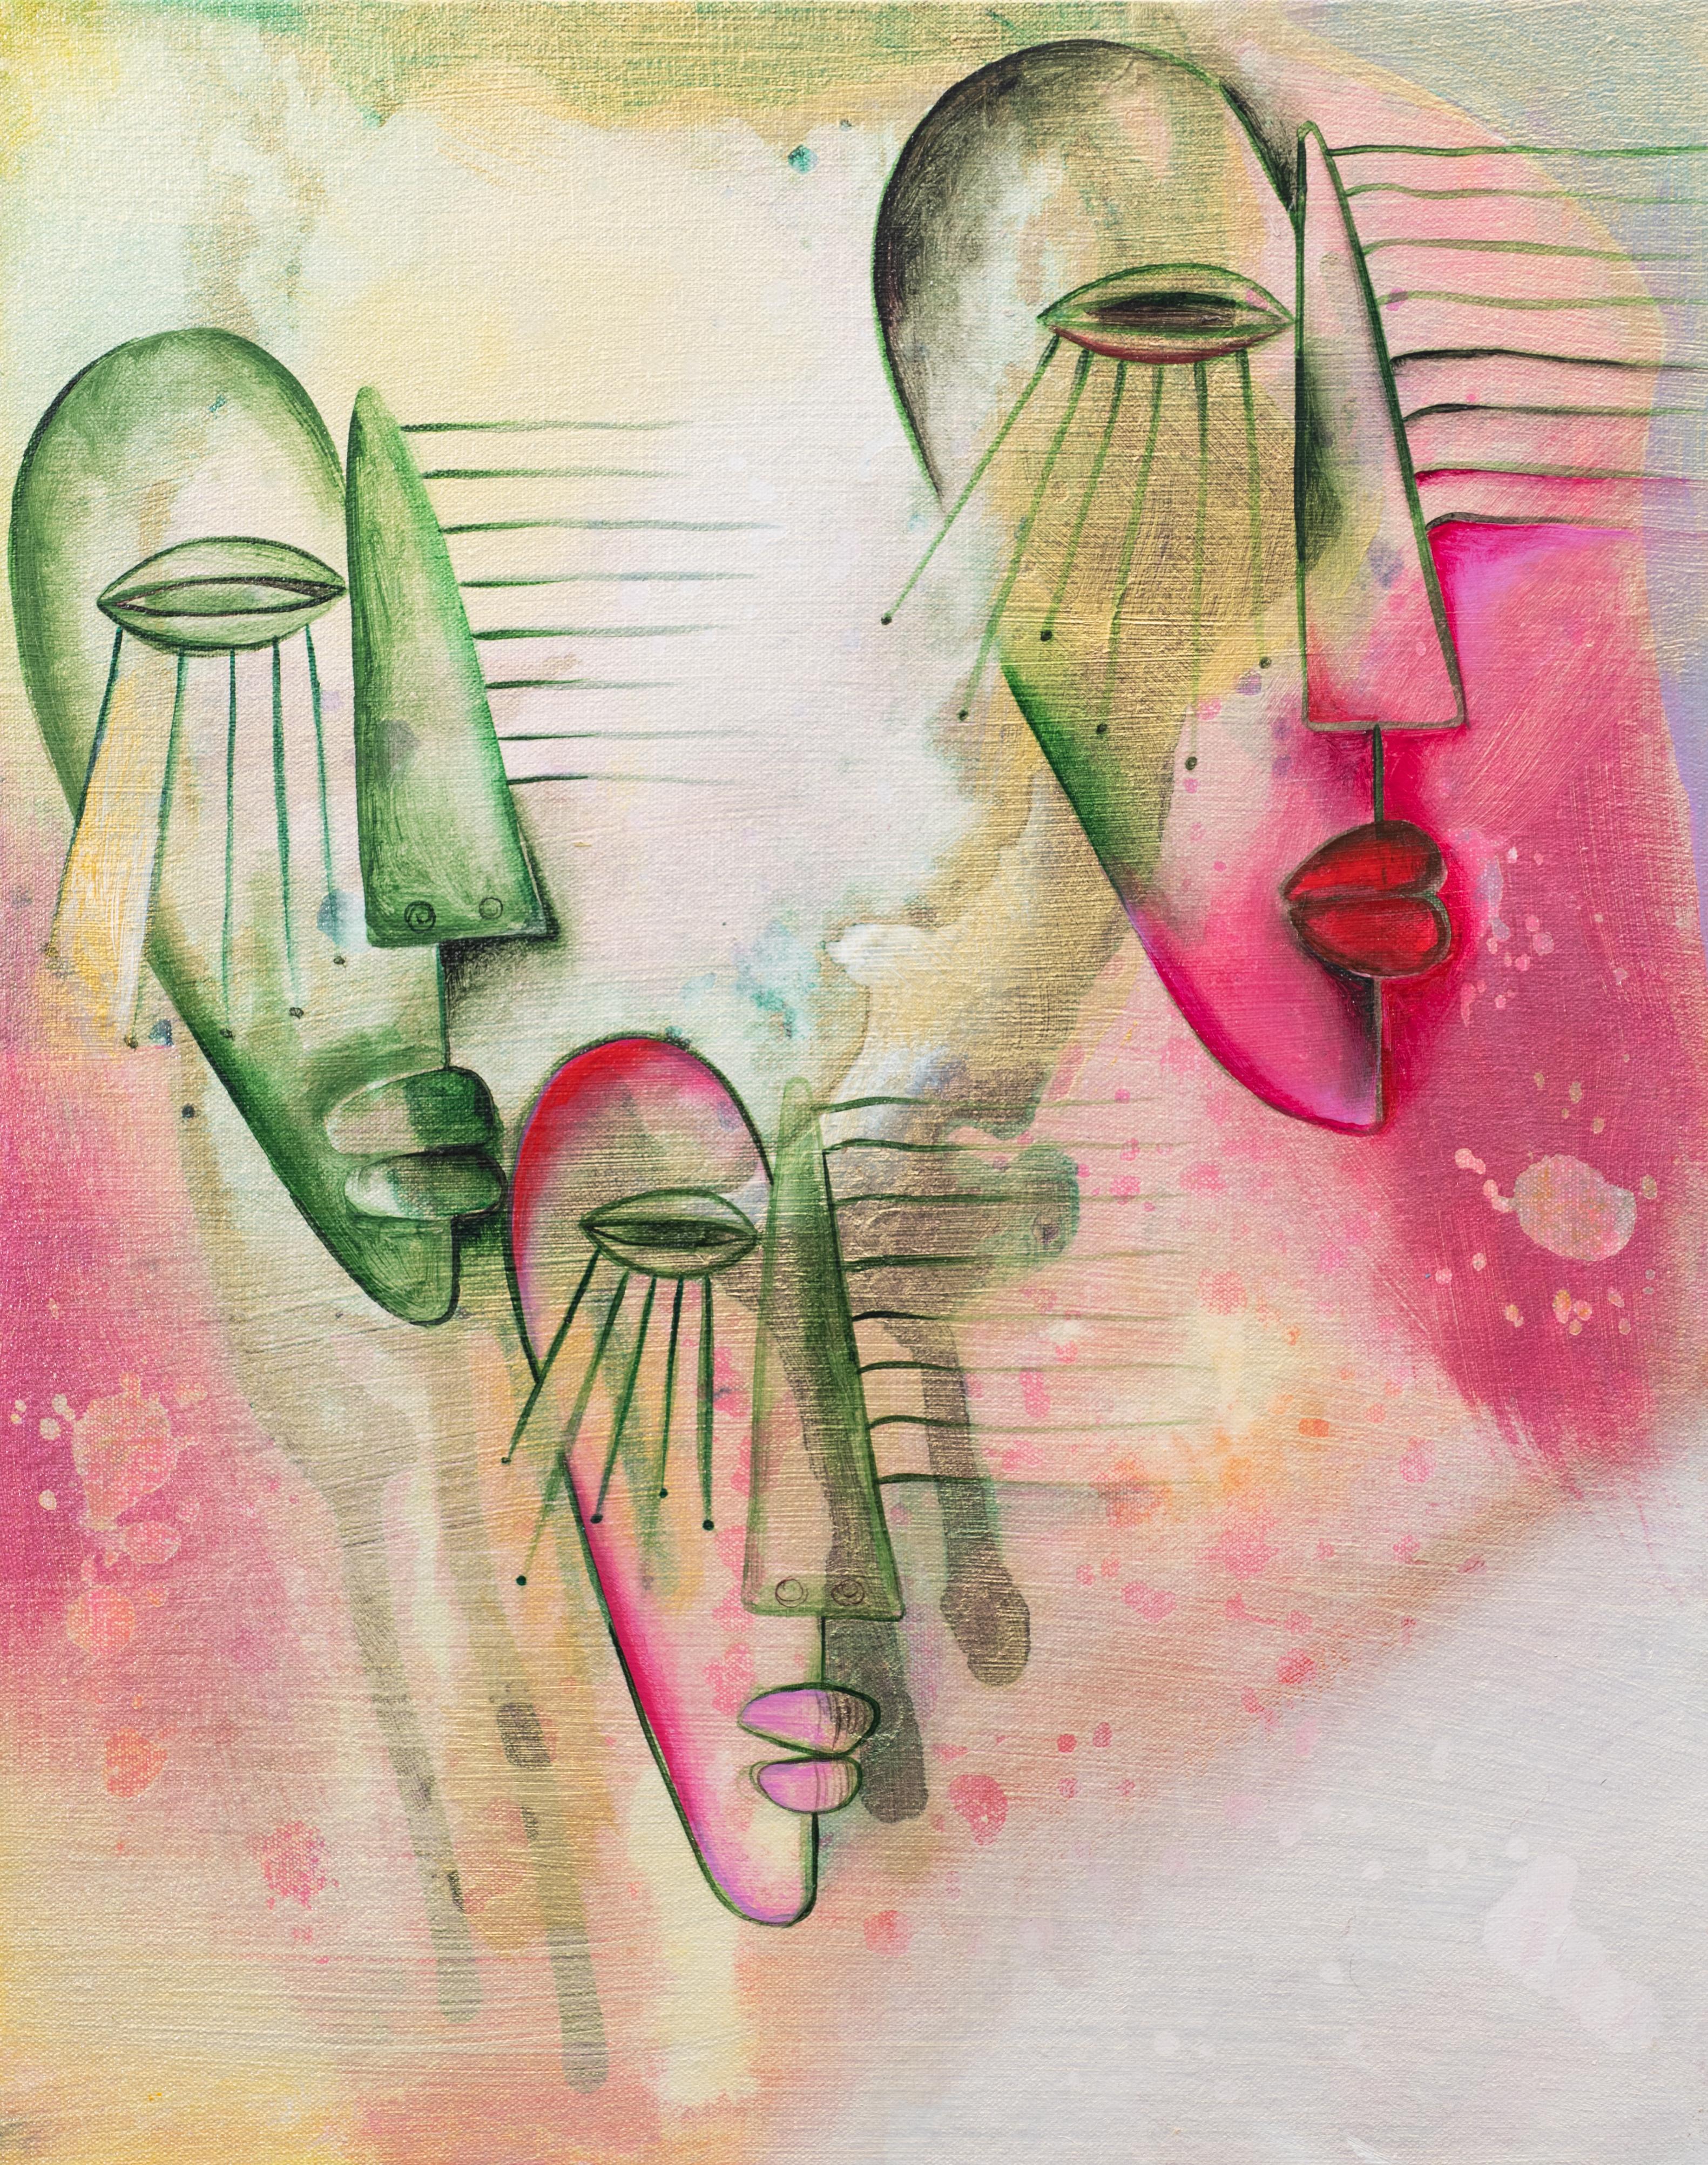 Alexandra Nechita - Progress Not Perfection, 2019; Painting; Original acrylic on canvas; Signed; Contemporary Art; Off The Wall Gallery; Houston.